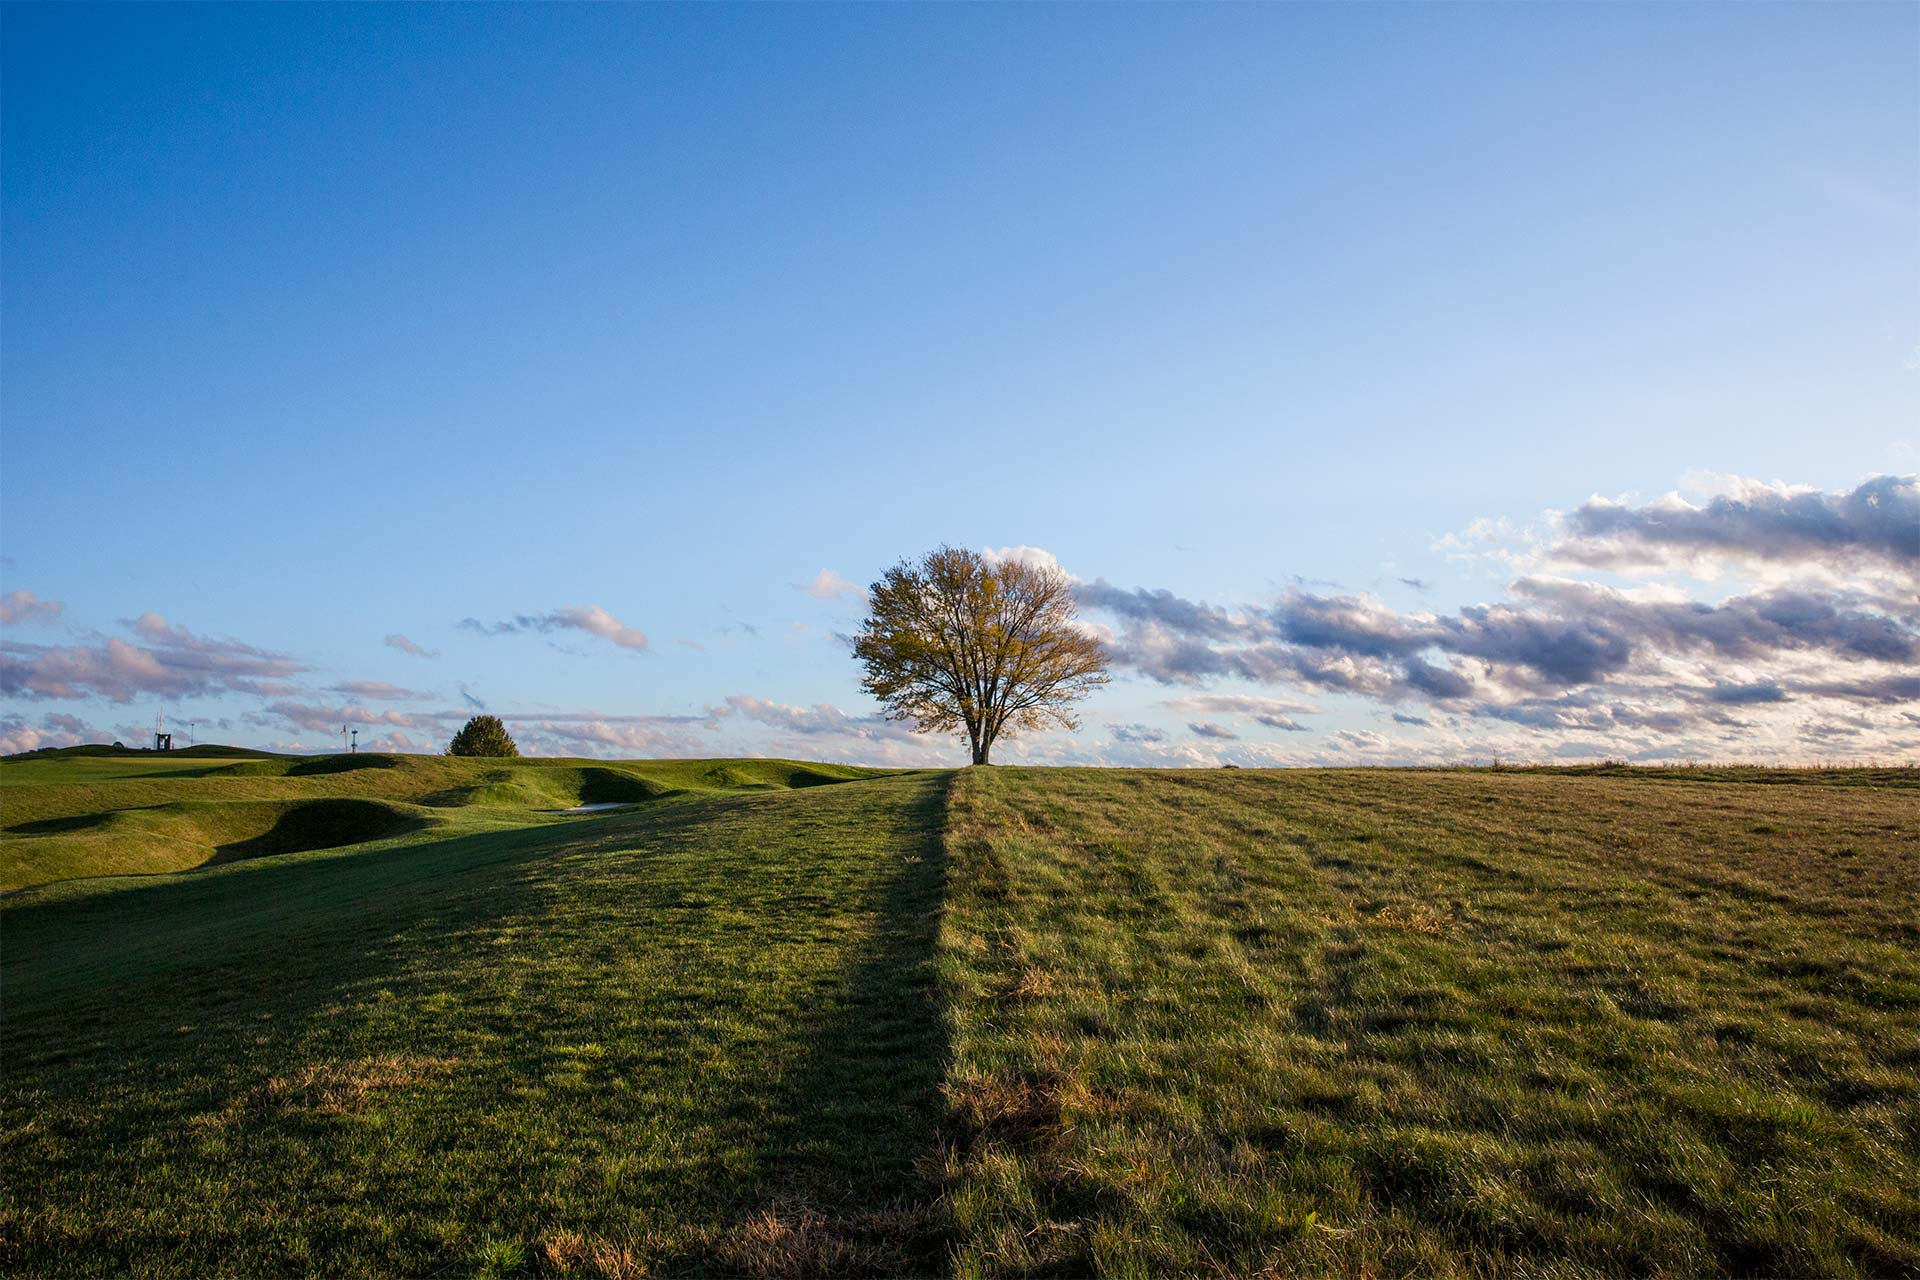 one tree in a large empty field